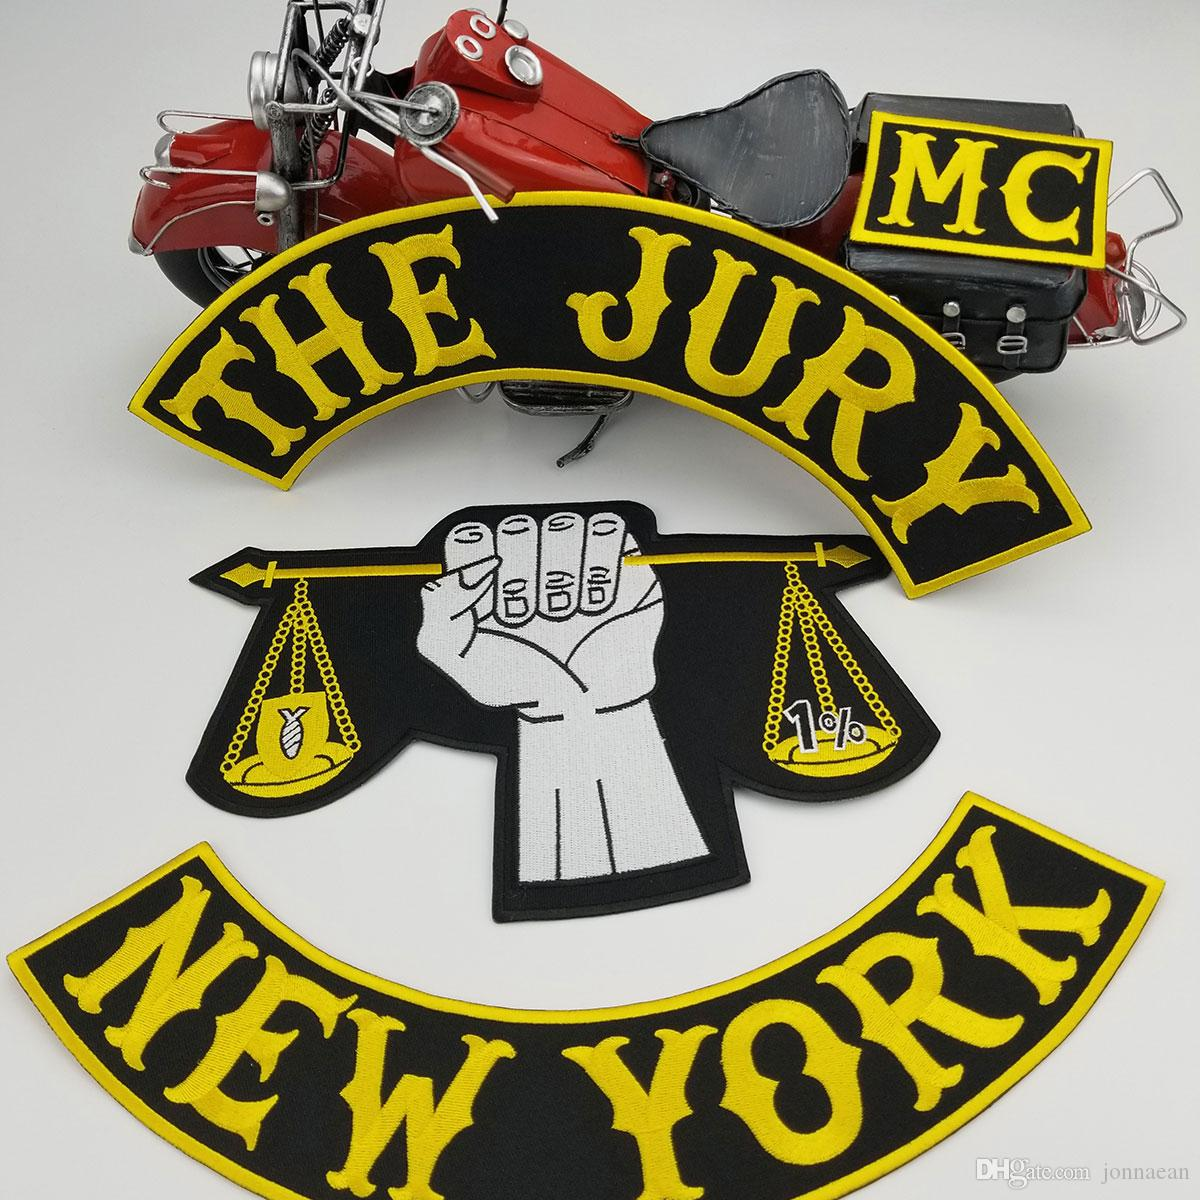 HOT SALE COOLEST THE JURY NEW YORK MOTORCYCLE CLUB VEST OUTLAW BIKER MC COLORS PATCH